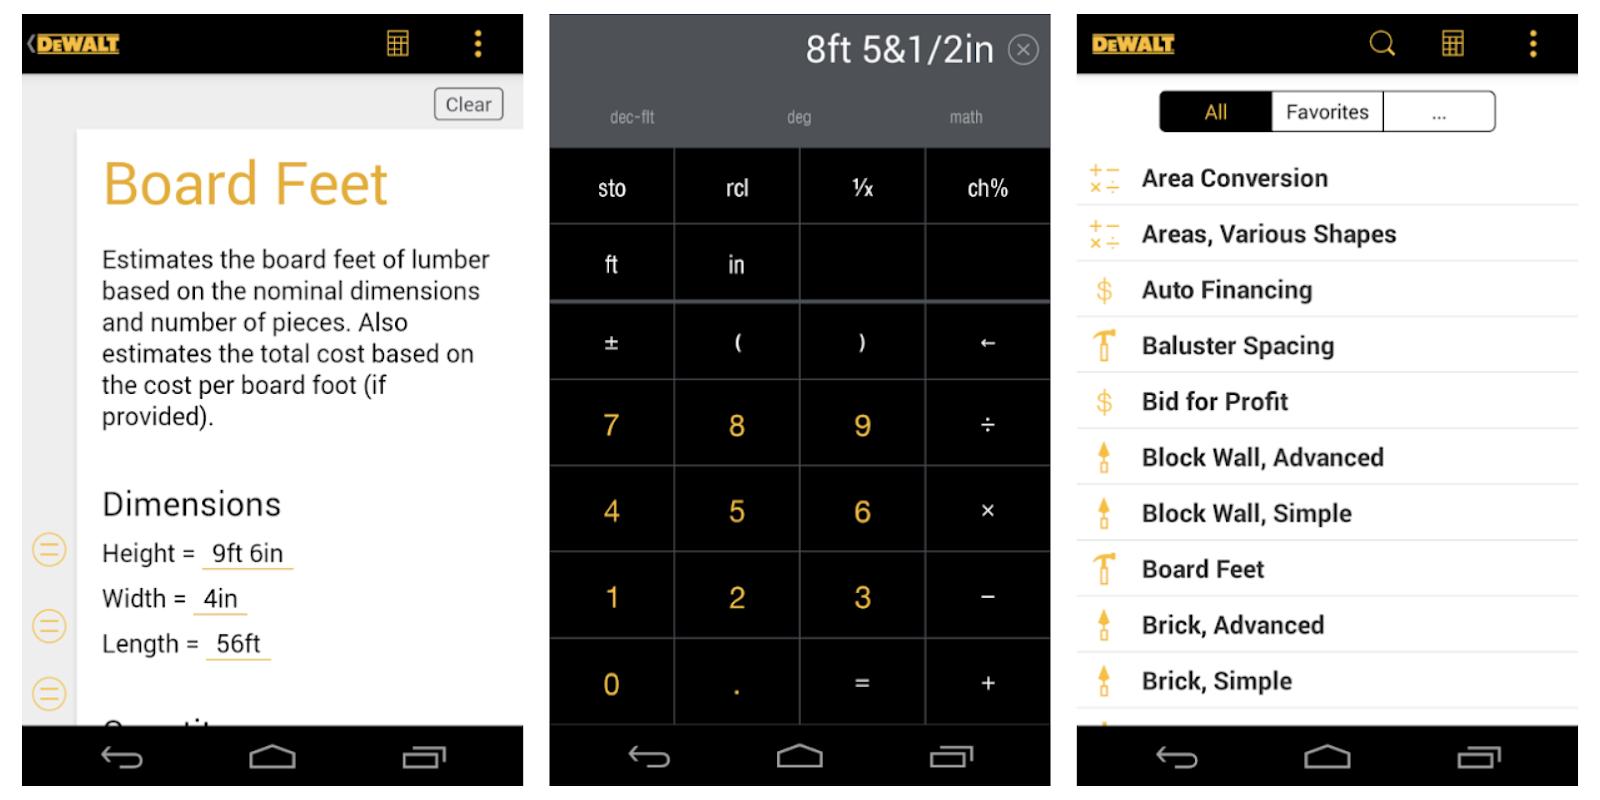 DeWalt Mobile Pro Construction Calculator App